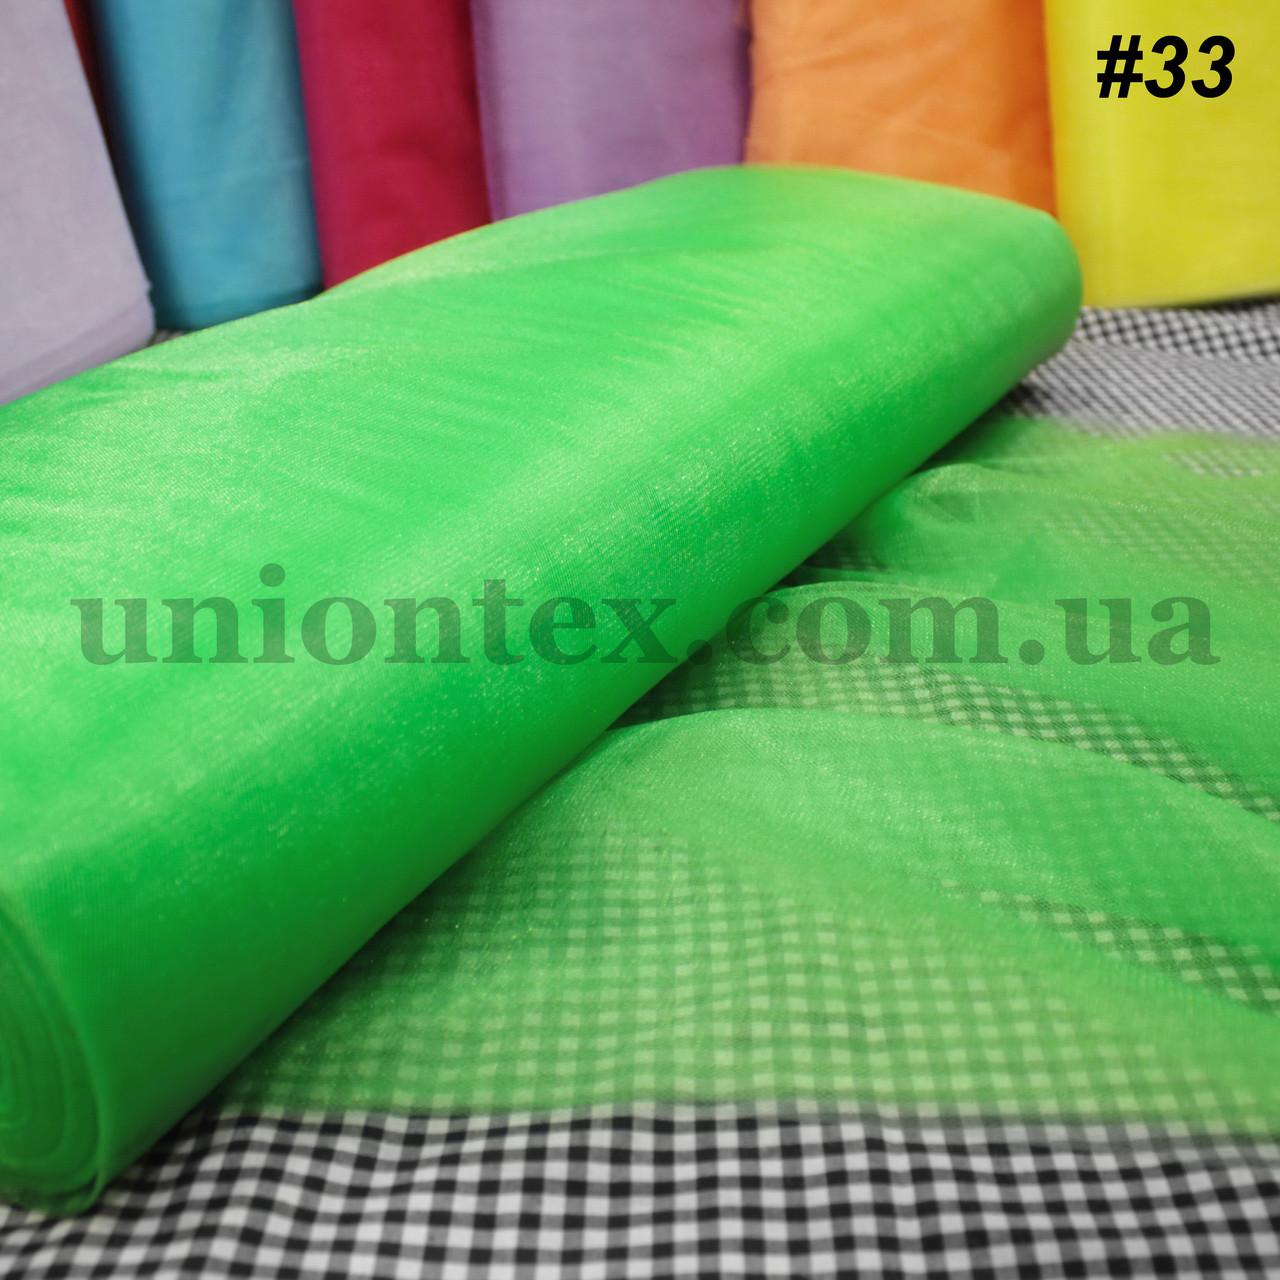 Фатин средней жесткости Kristal tul зеленый, ширина 3м